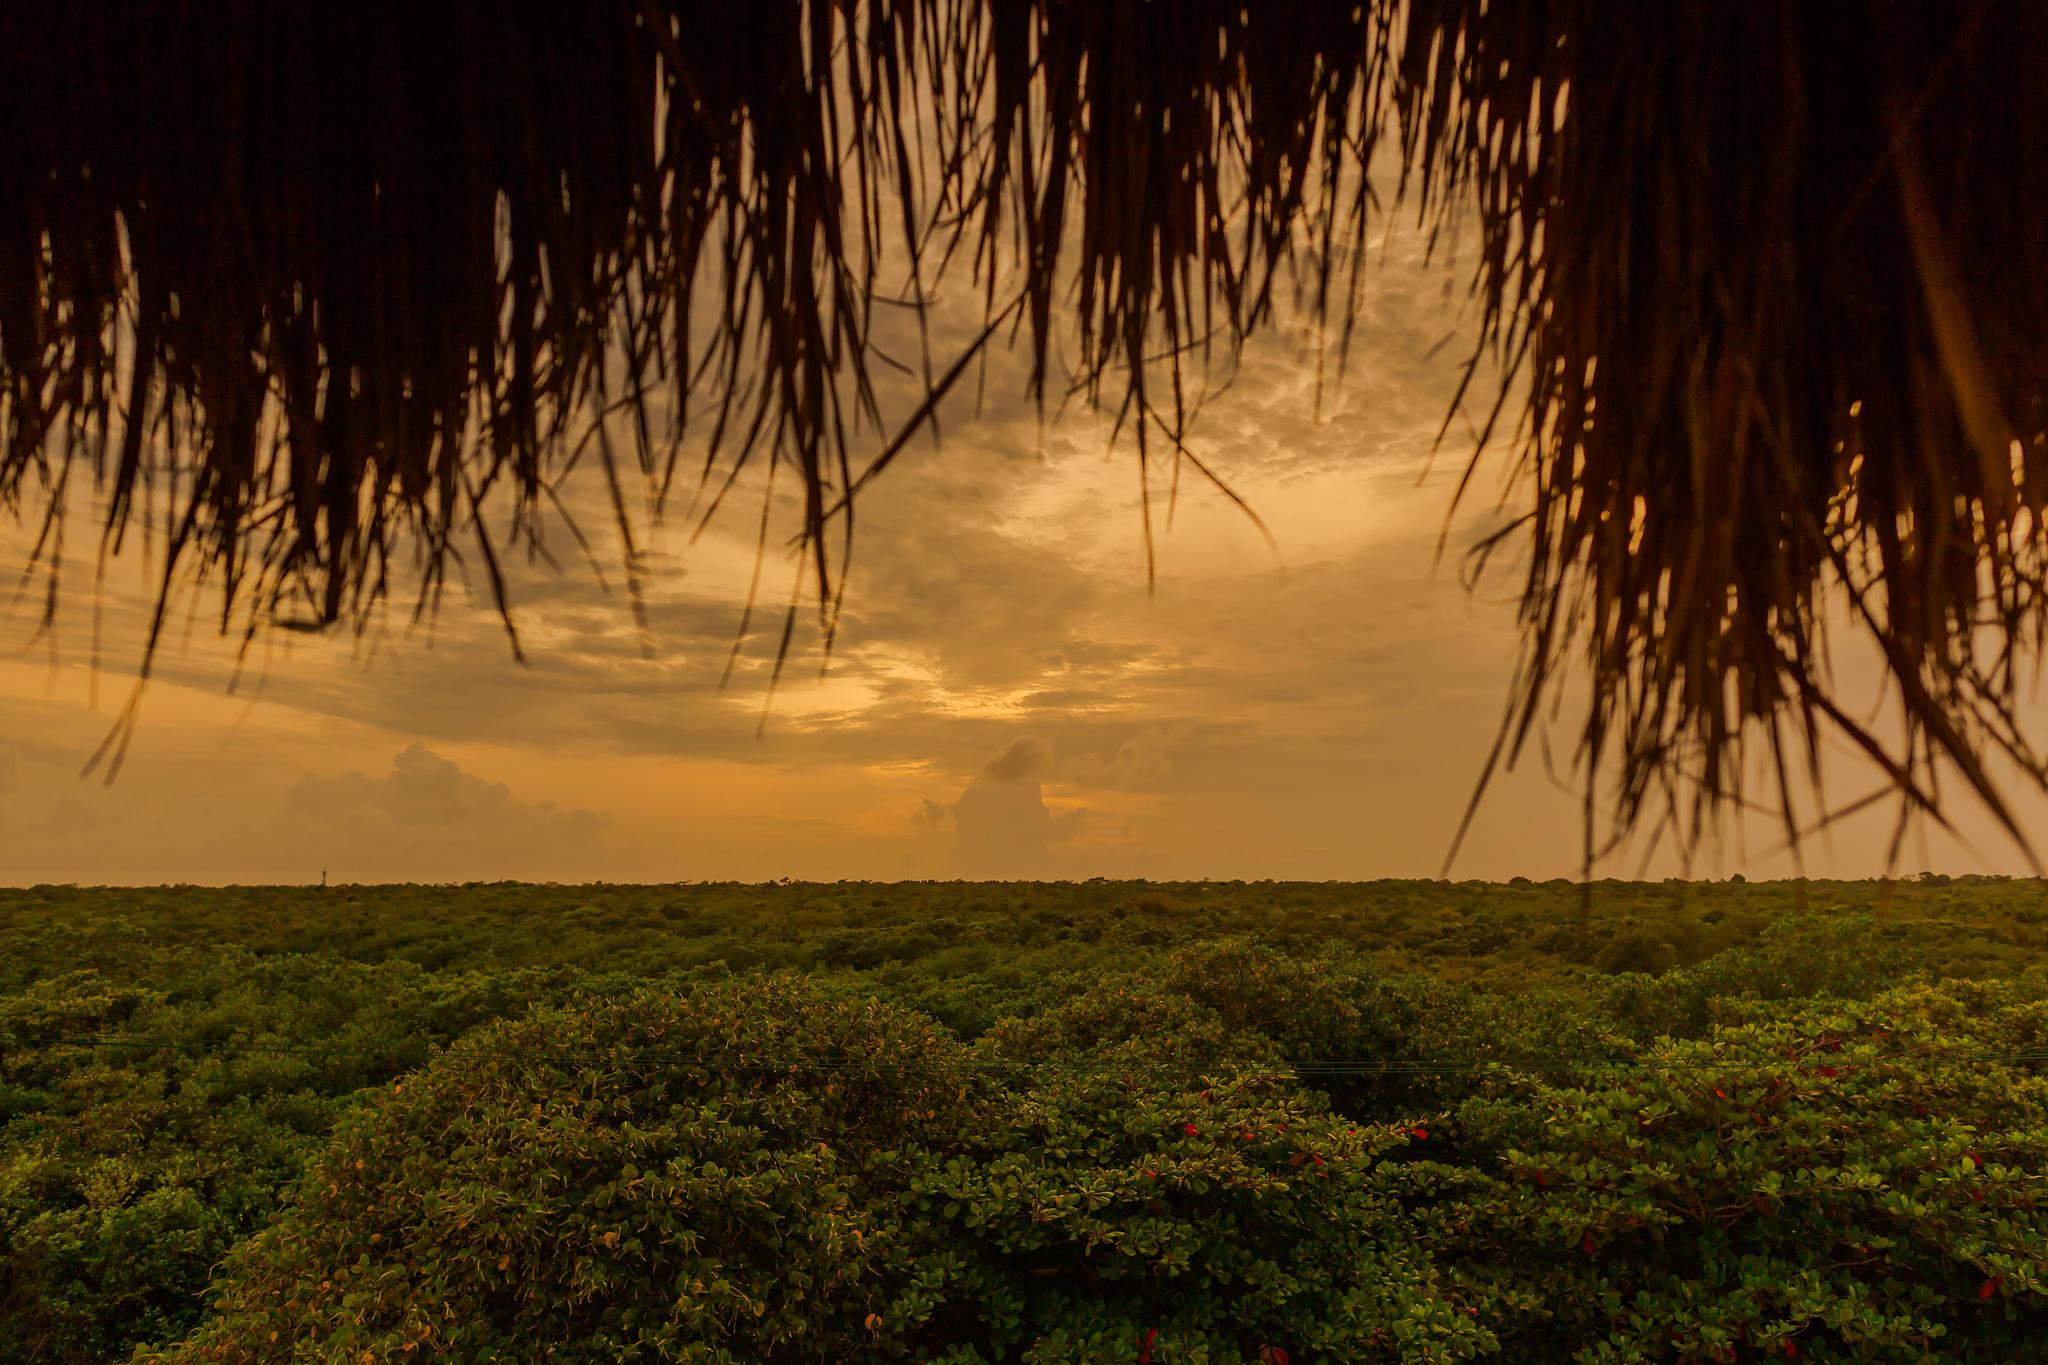 akumal mexico, travel photography, jennifer picard photography, sunshine coast bc photographer